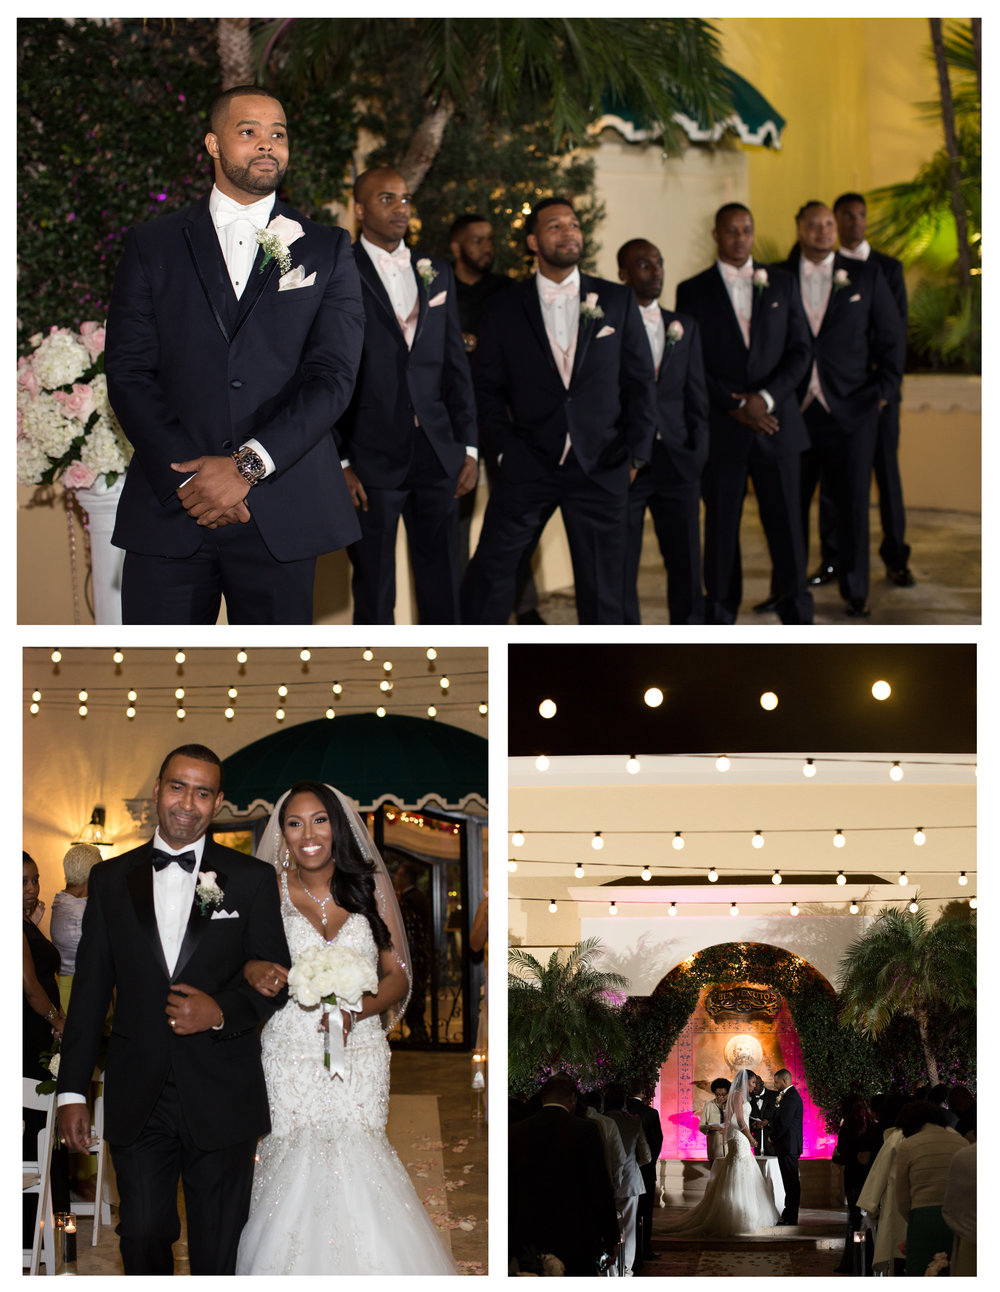 Benvenuto_wedding_Boynton_Beach_Jodi_Fjelde_Photography_Nikki_Otis_married_14.jpg